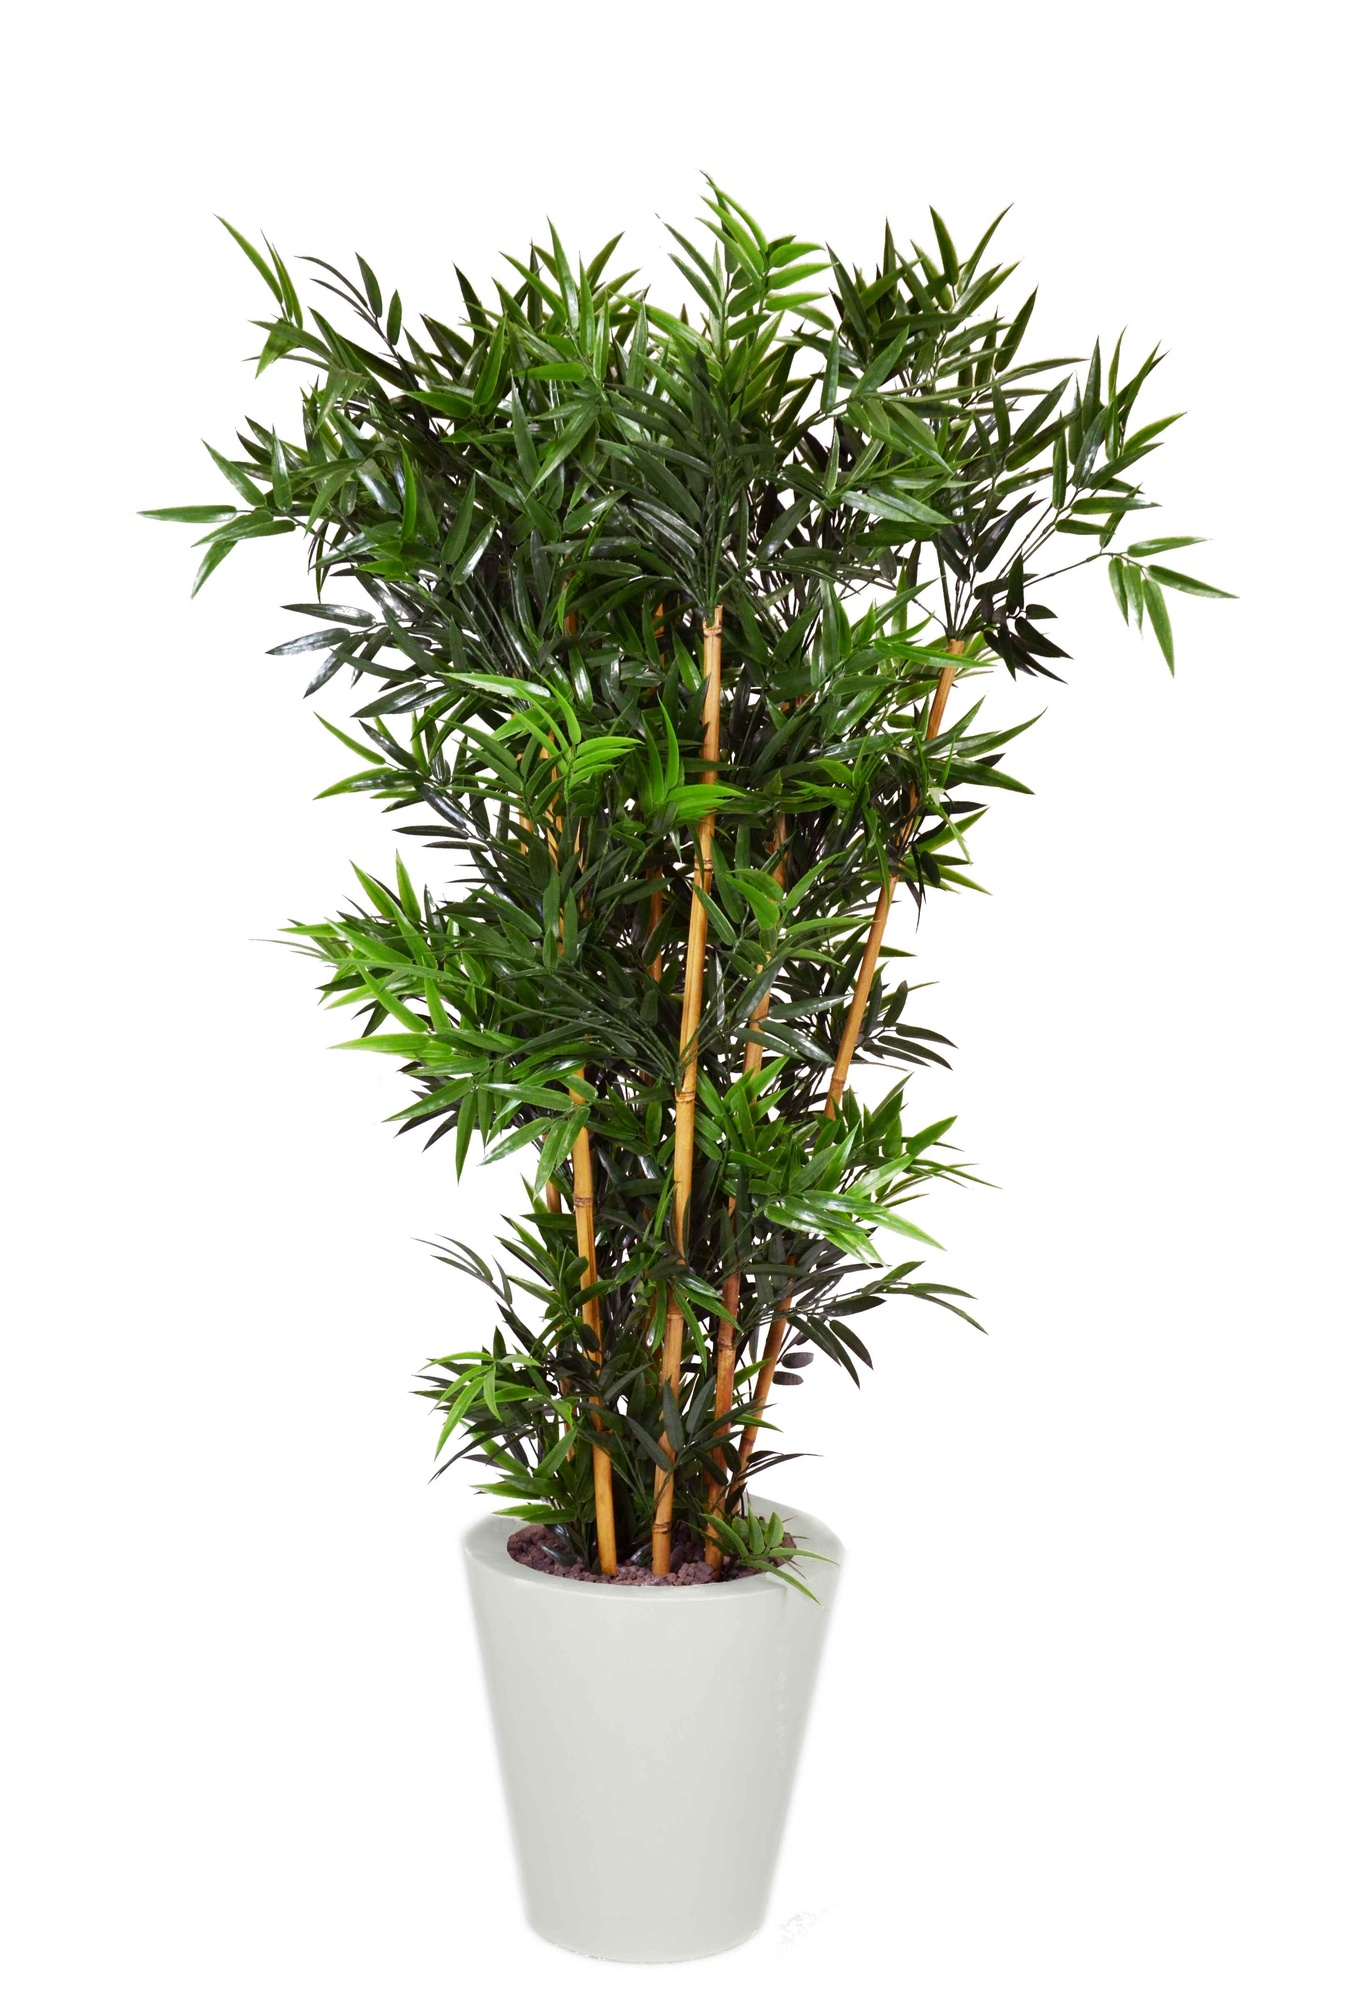 Bamboo piante artificiali da esterno interno viridium for Piante finte da esterno